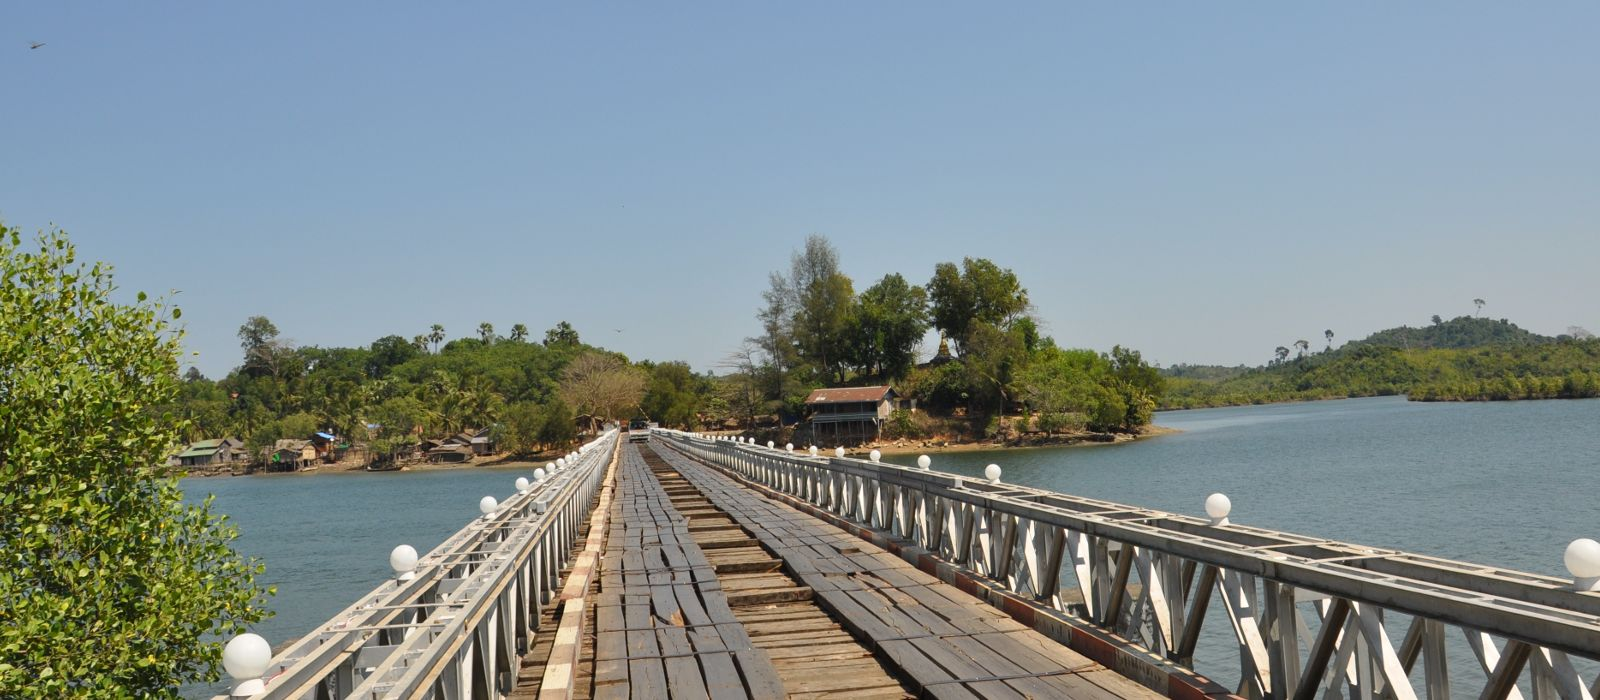 Destination Ngwe Saung Beach Myanmar